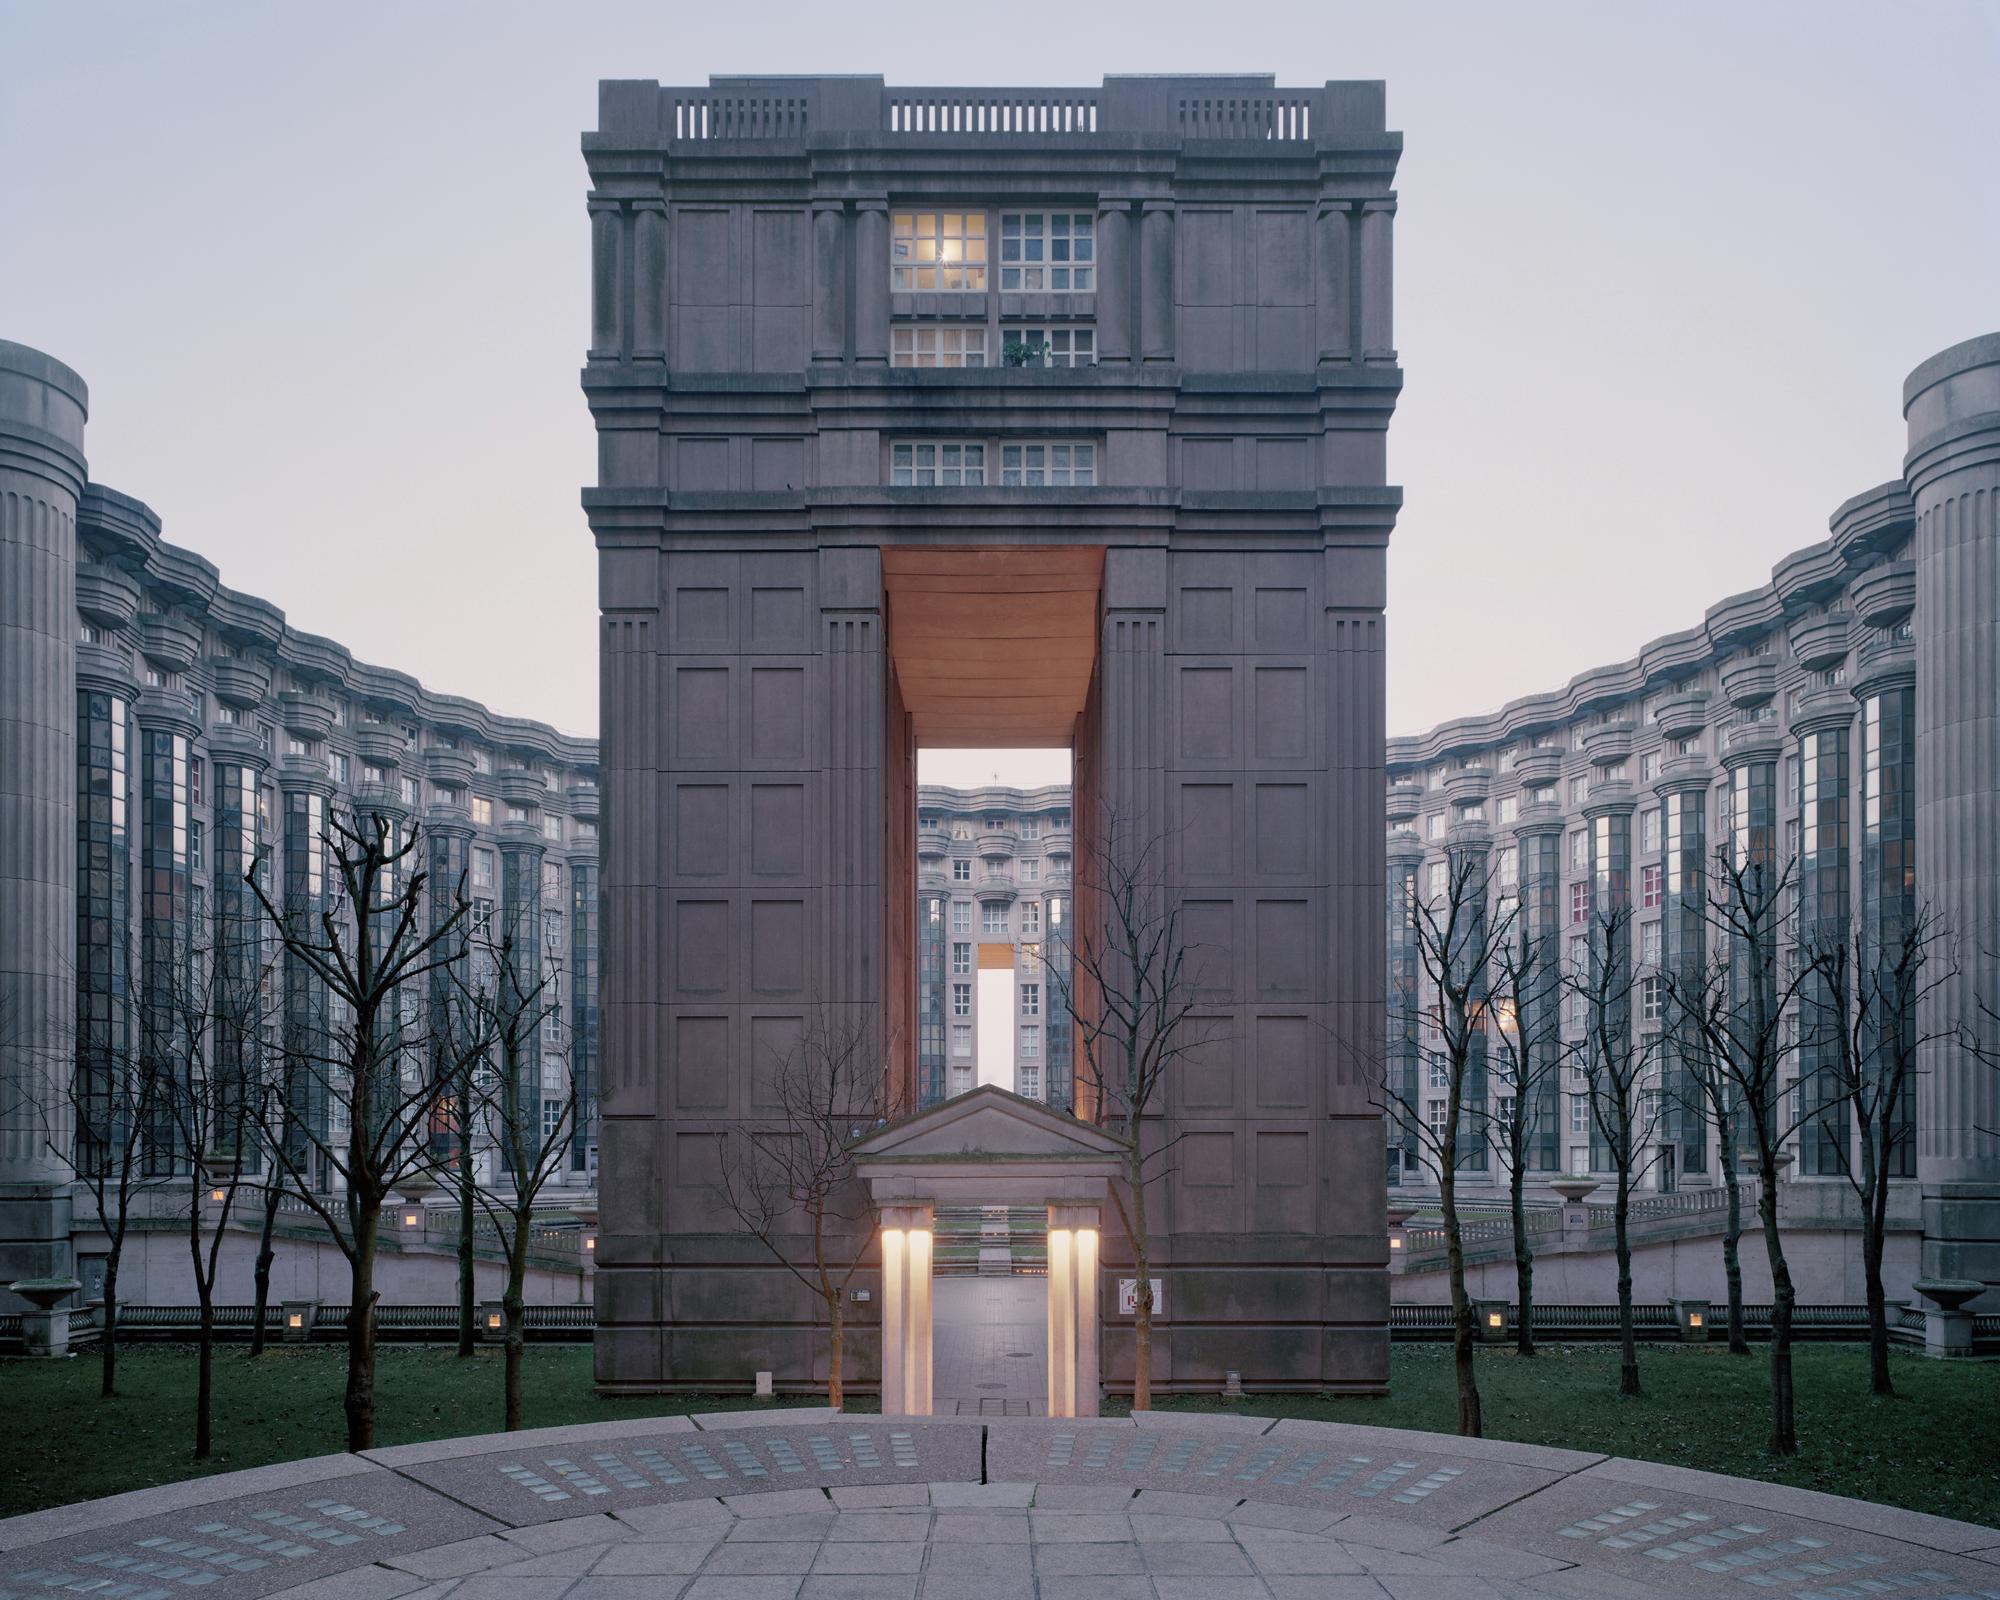 Noisy Le Grand Architecture a utopian dream stood still: ricardo bofill's postmodern